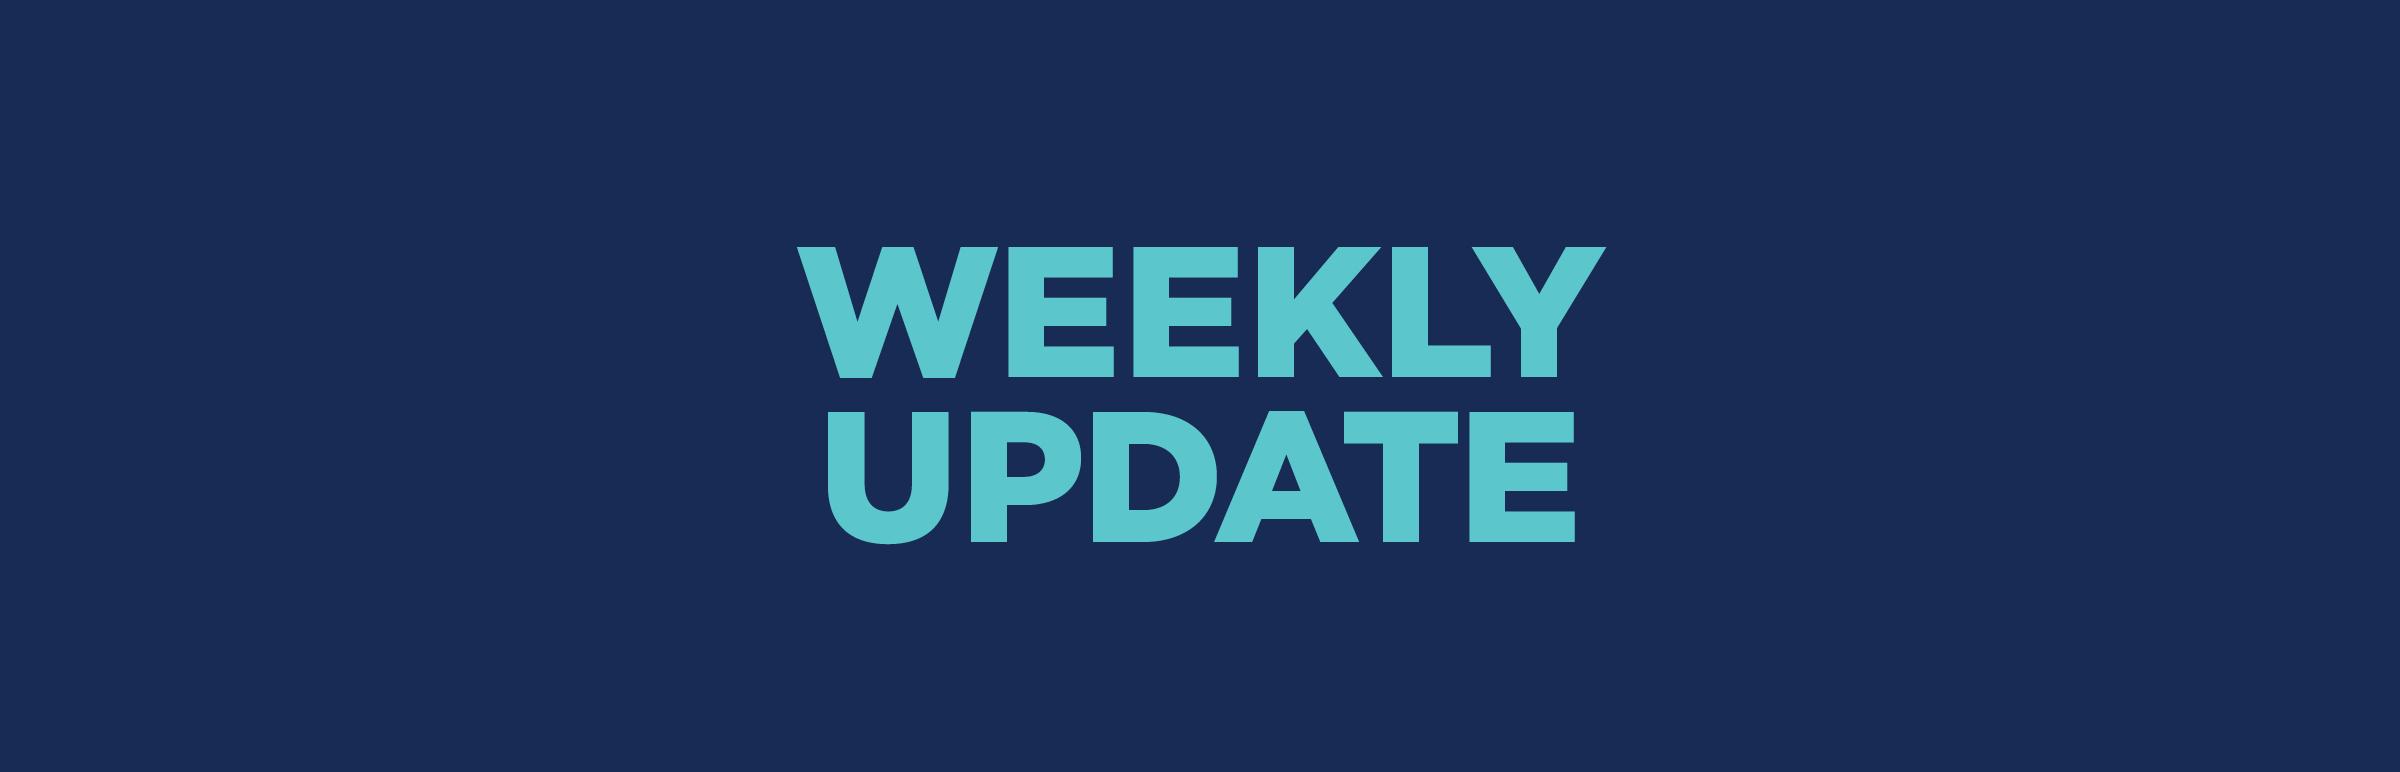 PGV-036-Weekly-Update-Web-Image (1)